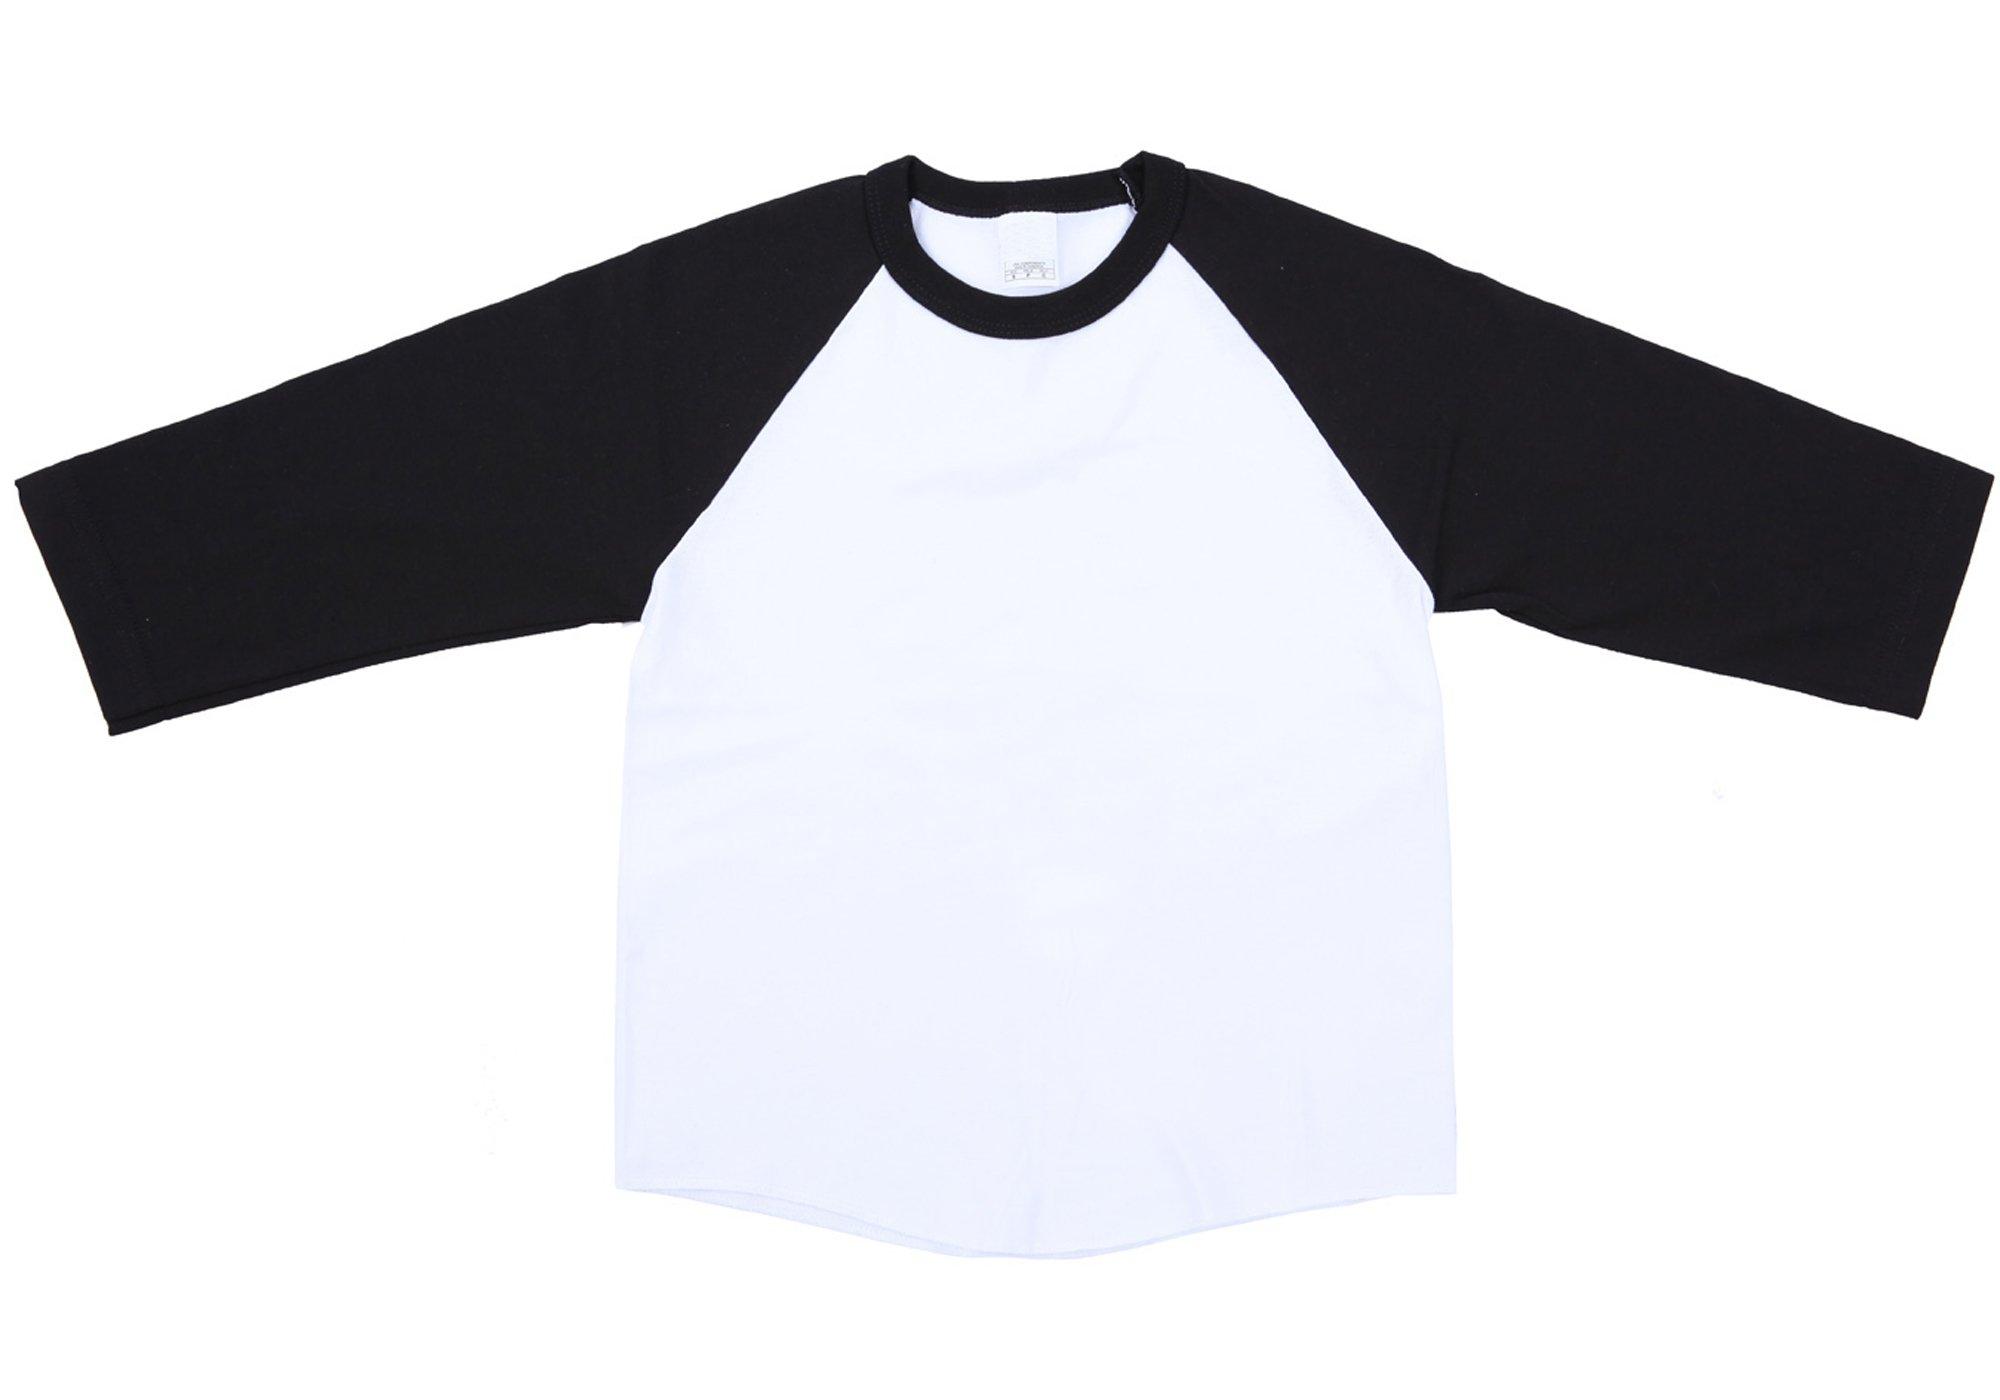 Ola Mari Unisex Kids Raglan Baseball T Shirt Top, Small, White/Black